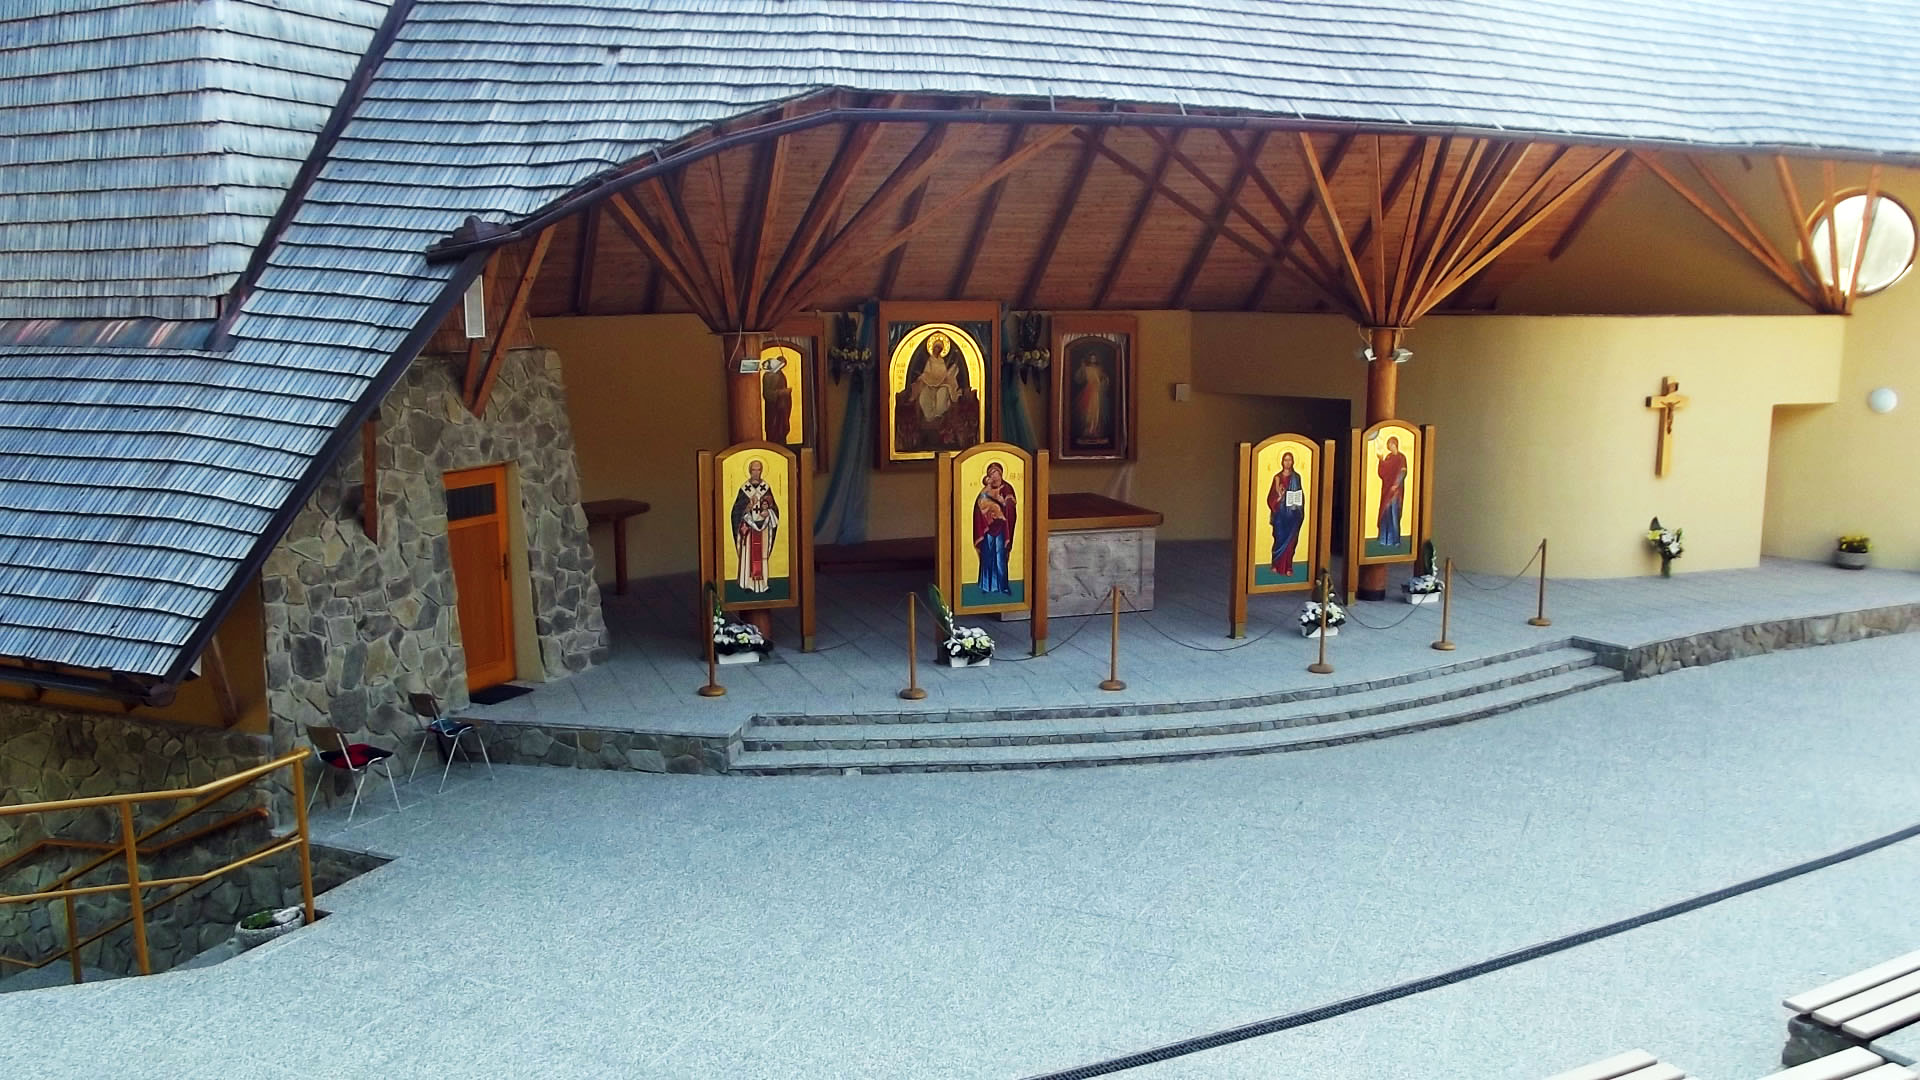 Aparición a Católicos Bizantinos: La Inmaculada Pureza de Litmanova, Eslovaquia (5 ago)